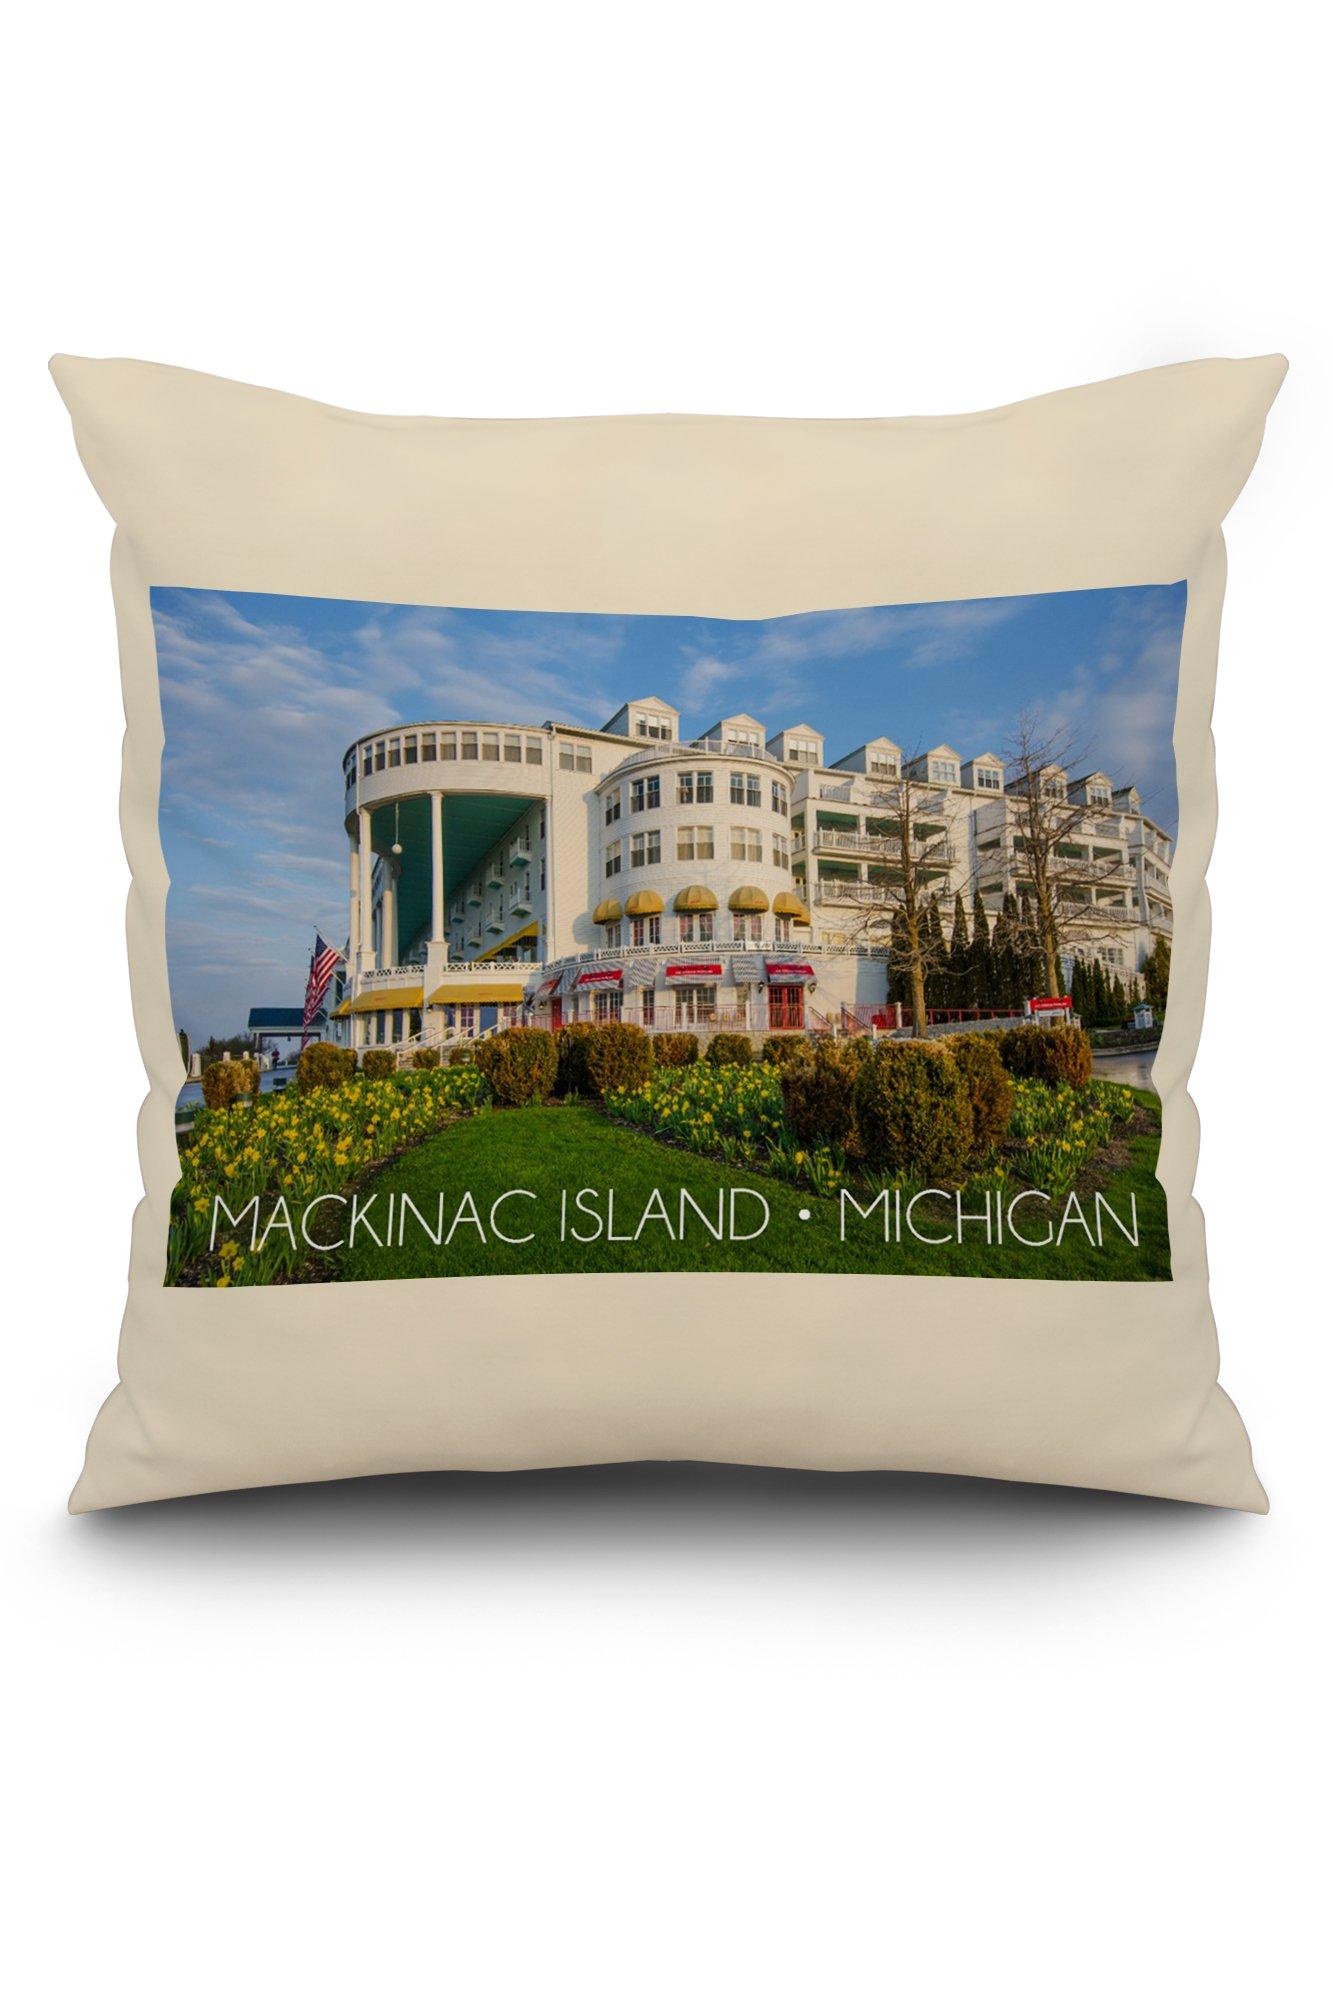 Mackinac Island, Michigan - Grand Hotel (20x20 Spun Polyester Pillow, White Border)